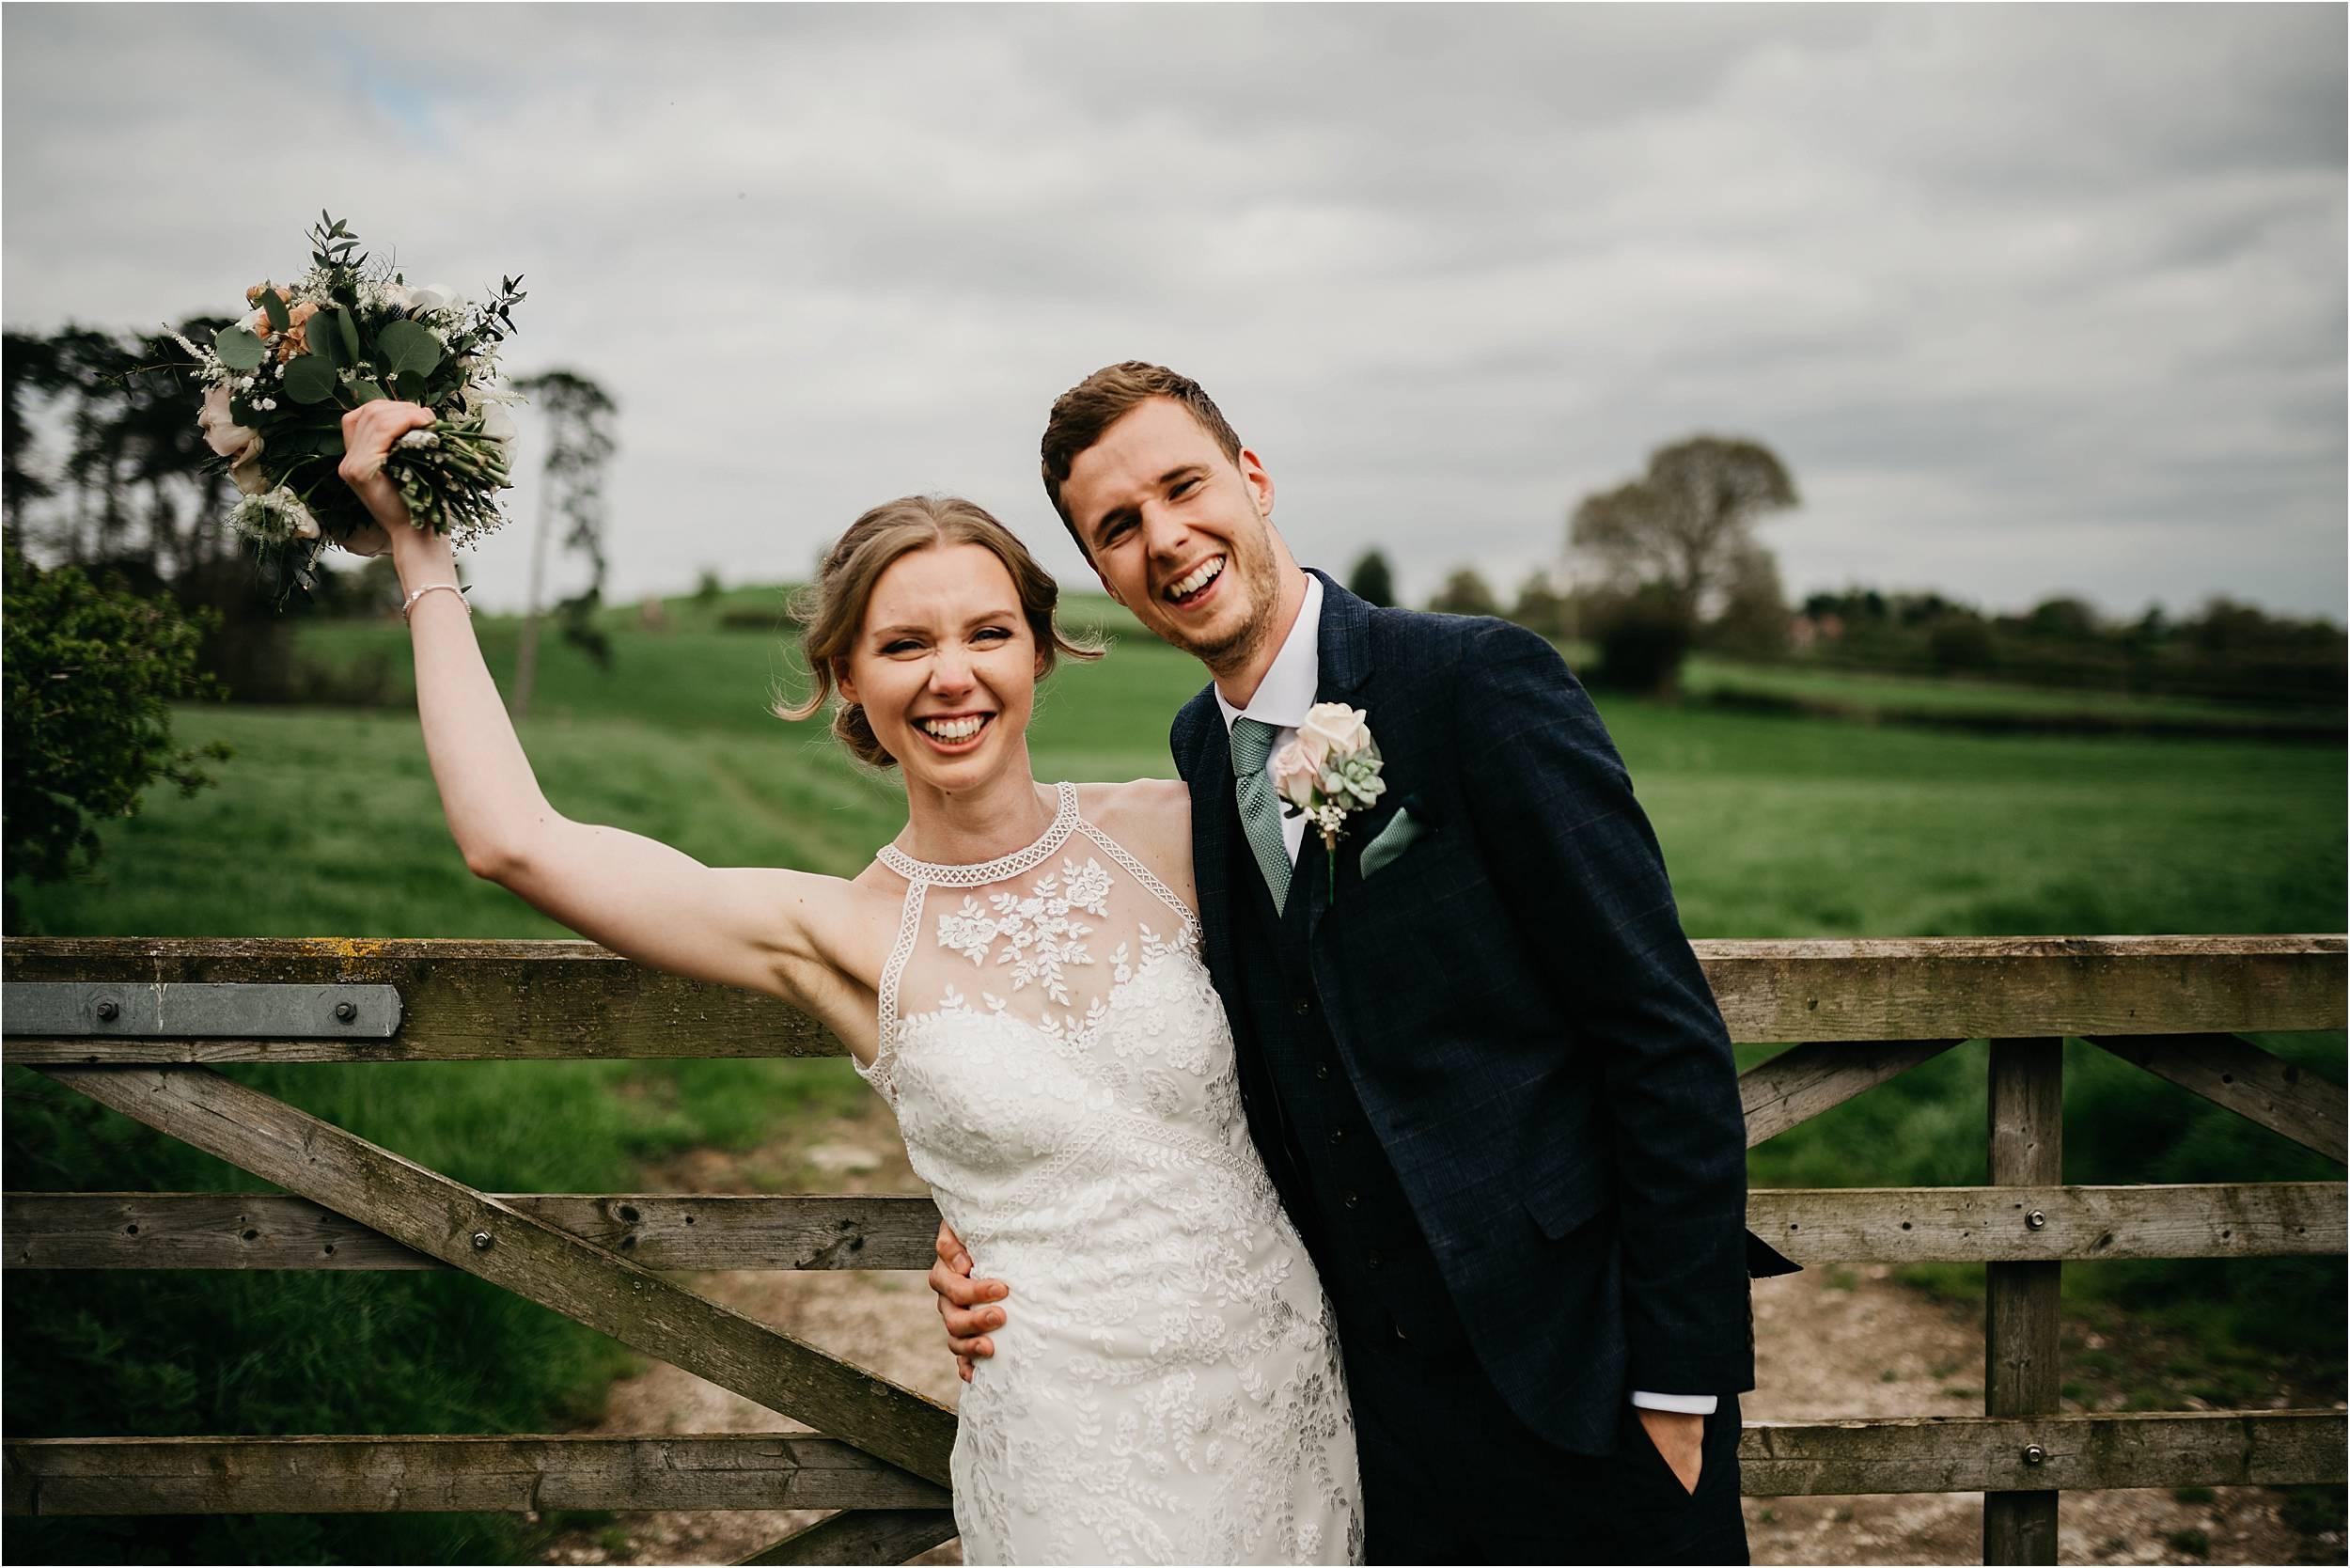 Kedleston Country House Wedding Photography_0067.jpg